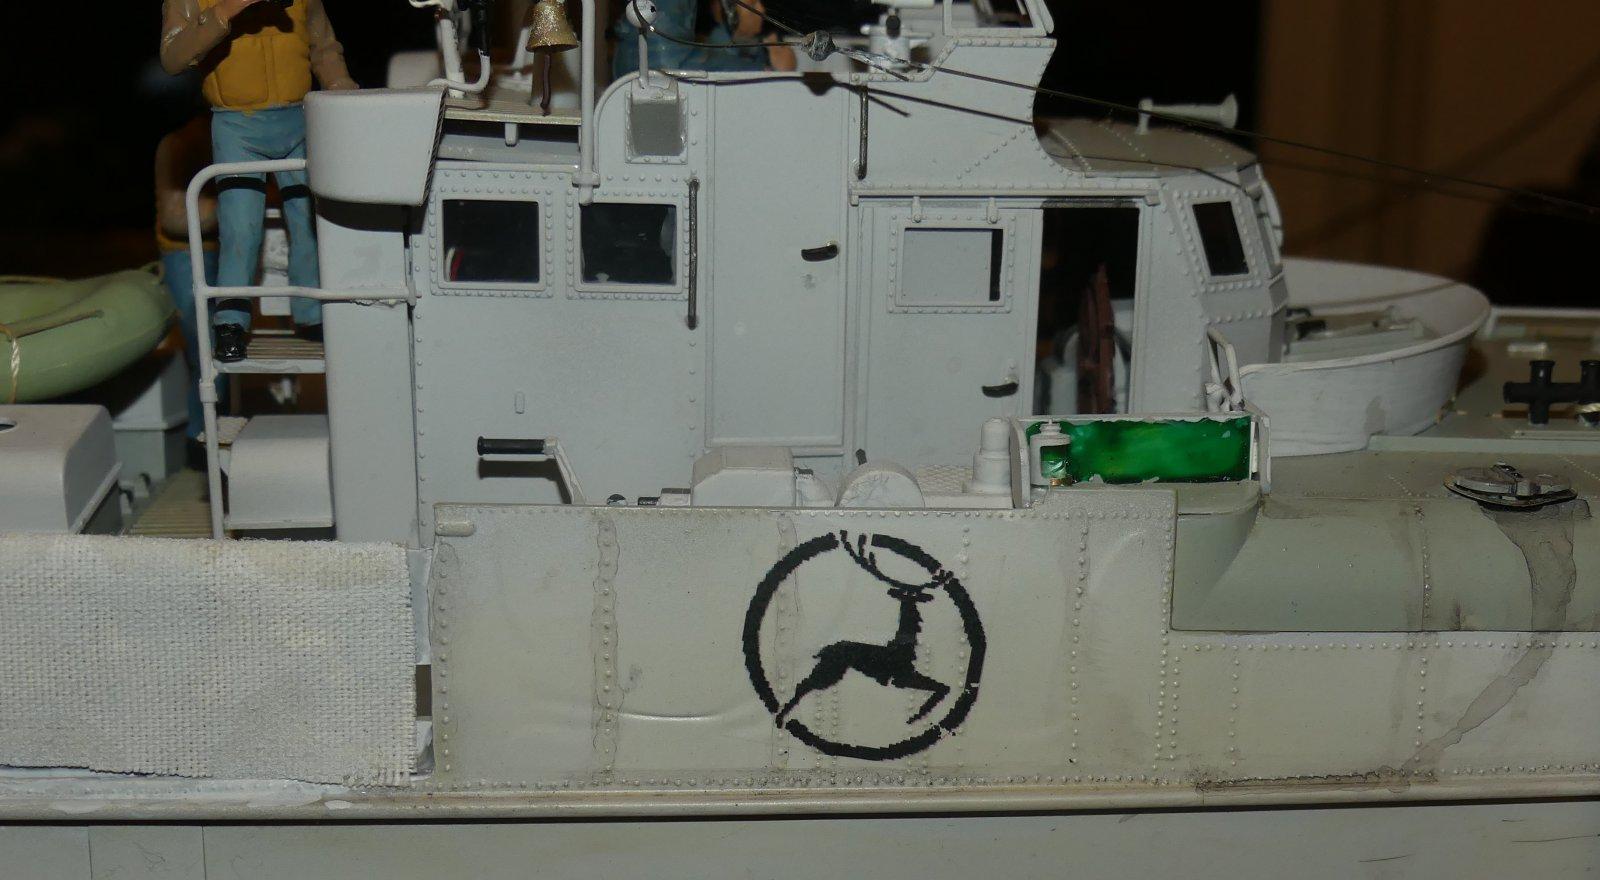 embleem 8e flottille.jpg